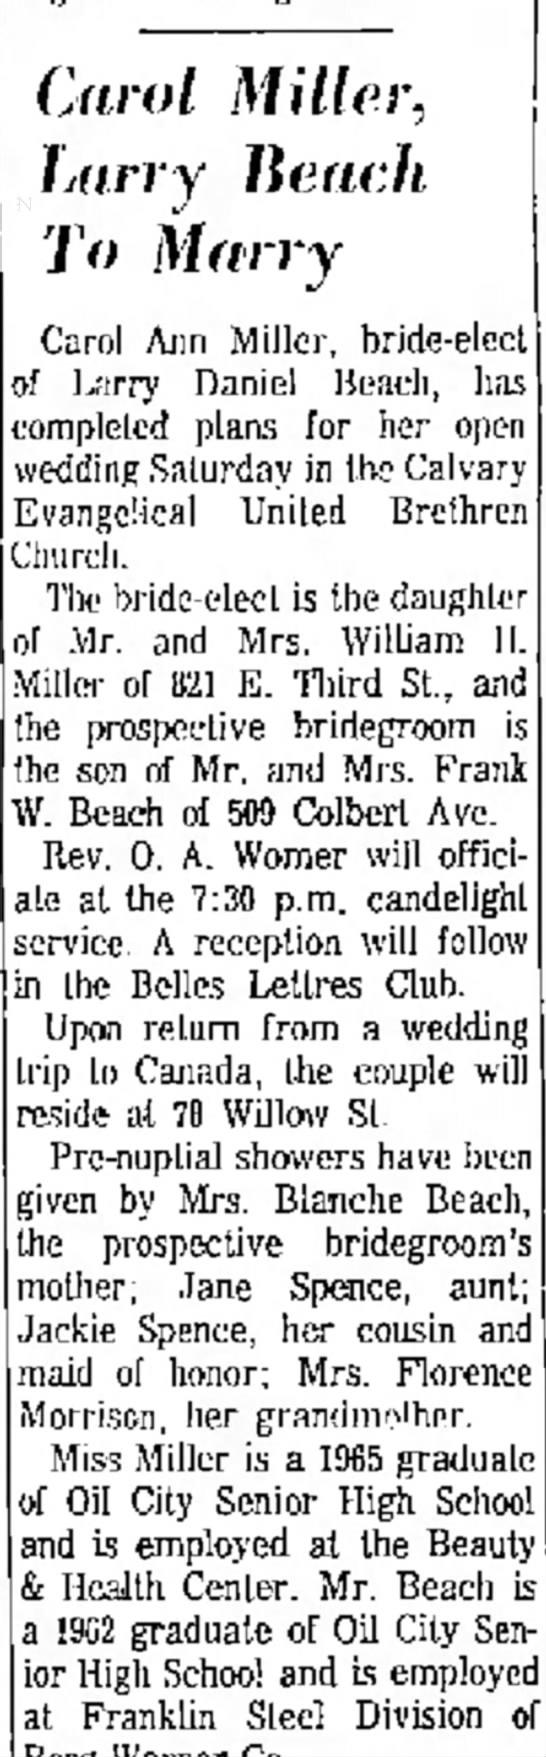 Larry Beach & Carol Miller wedding announcement June 1965 - u l t i divorcee--while l e Ihe to promotion i...